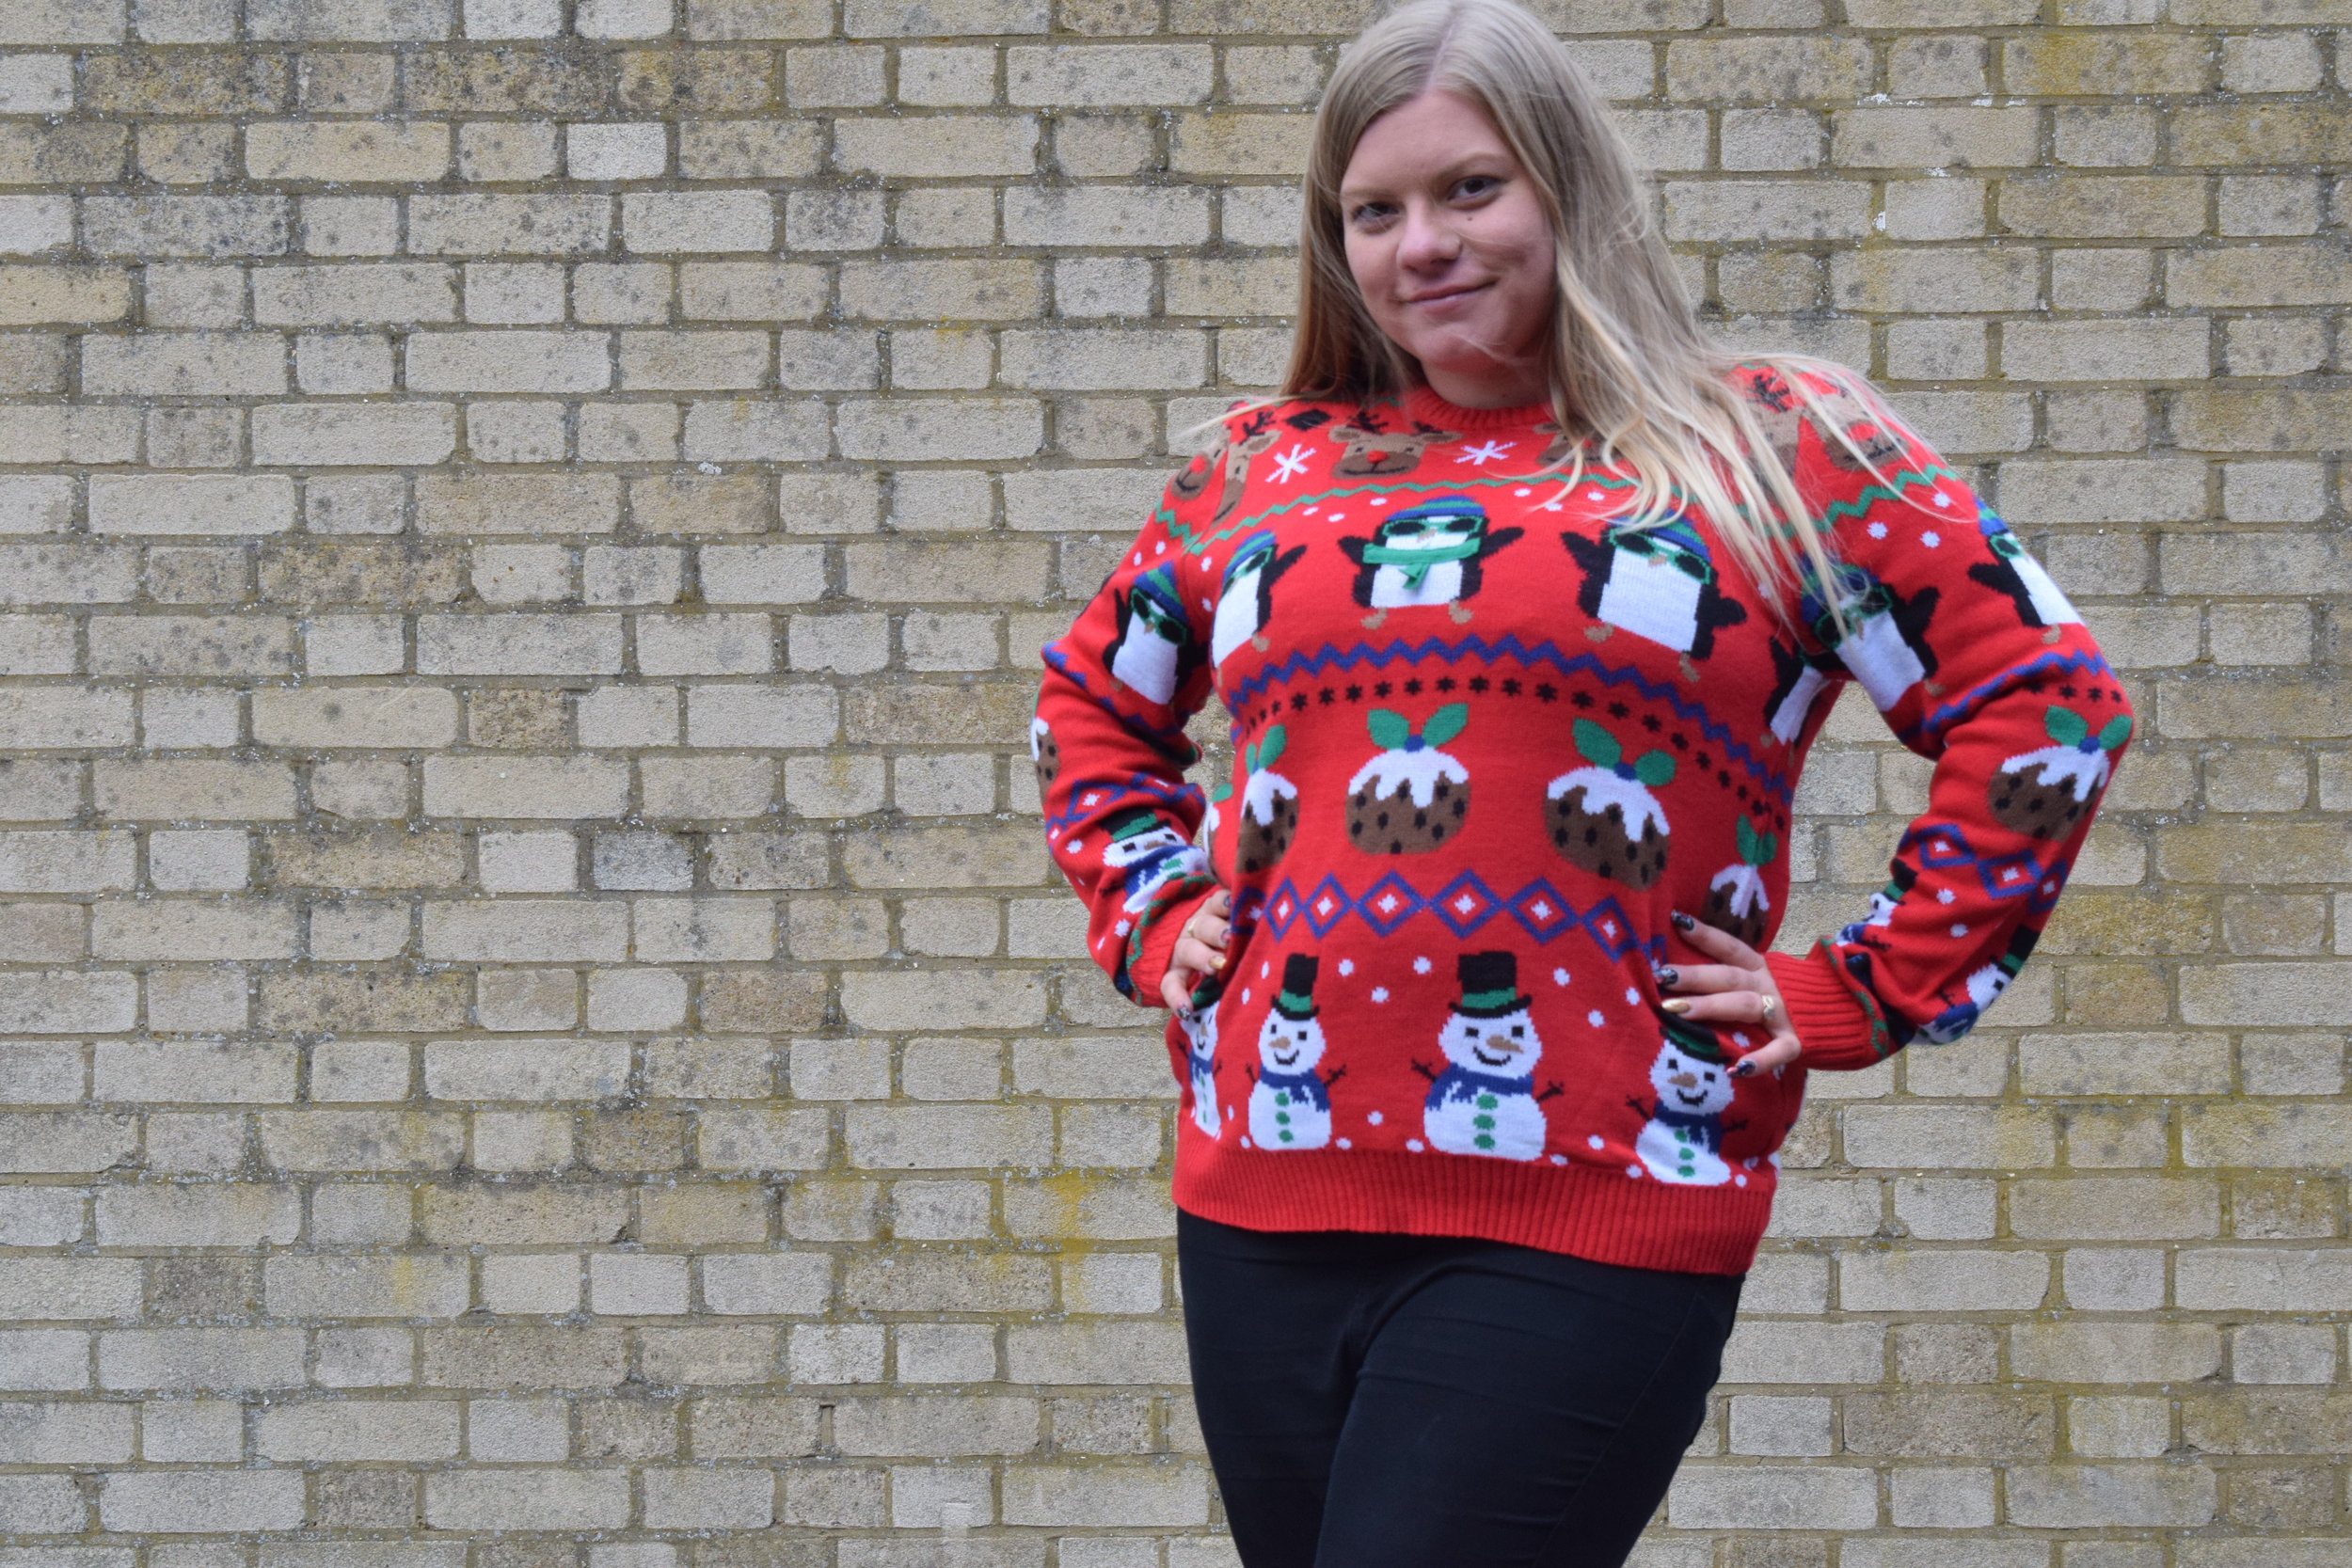 Christmas jumper love